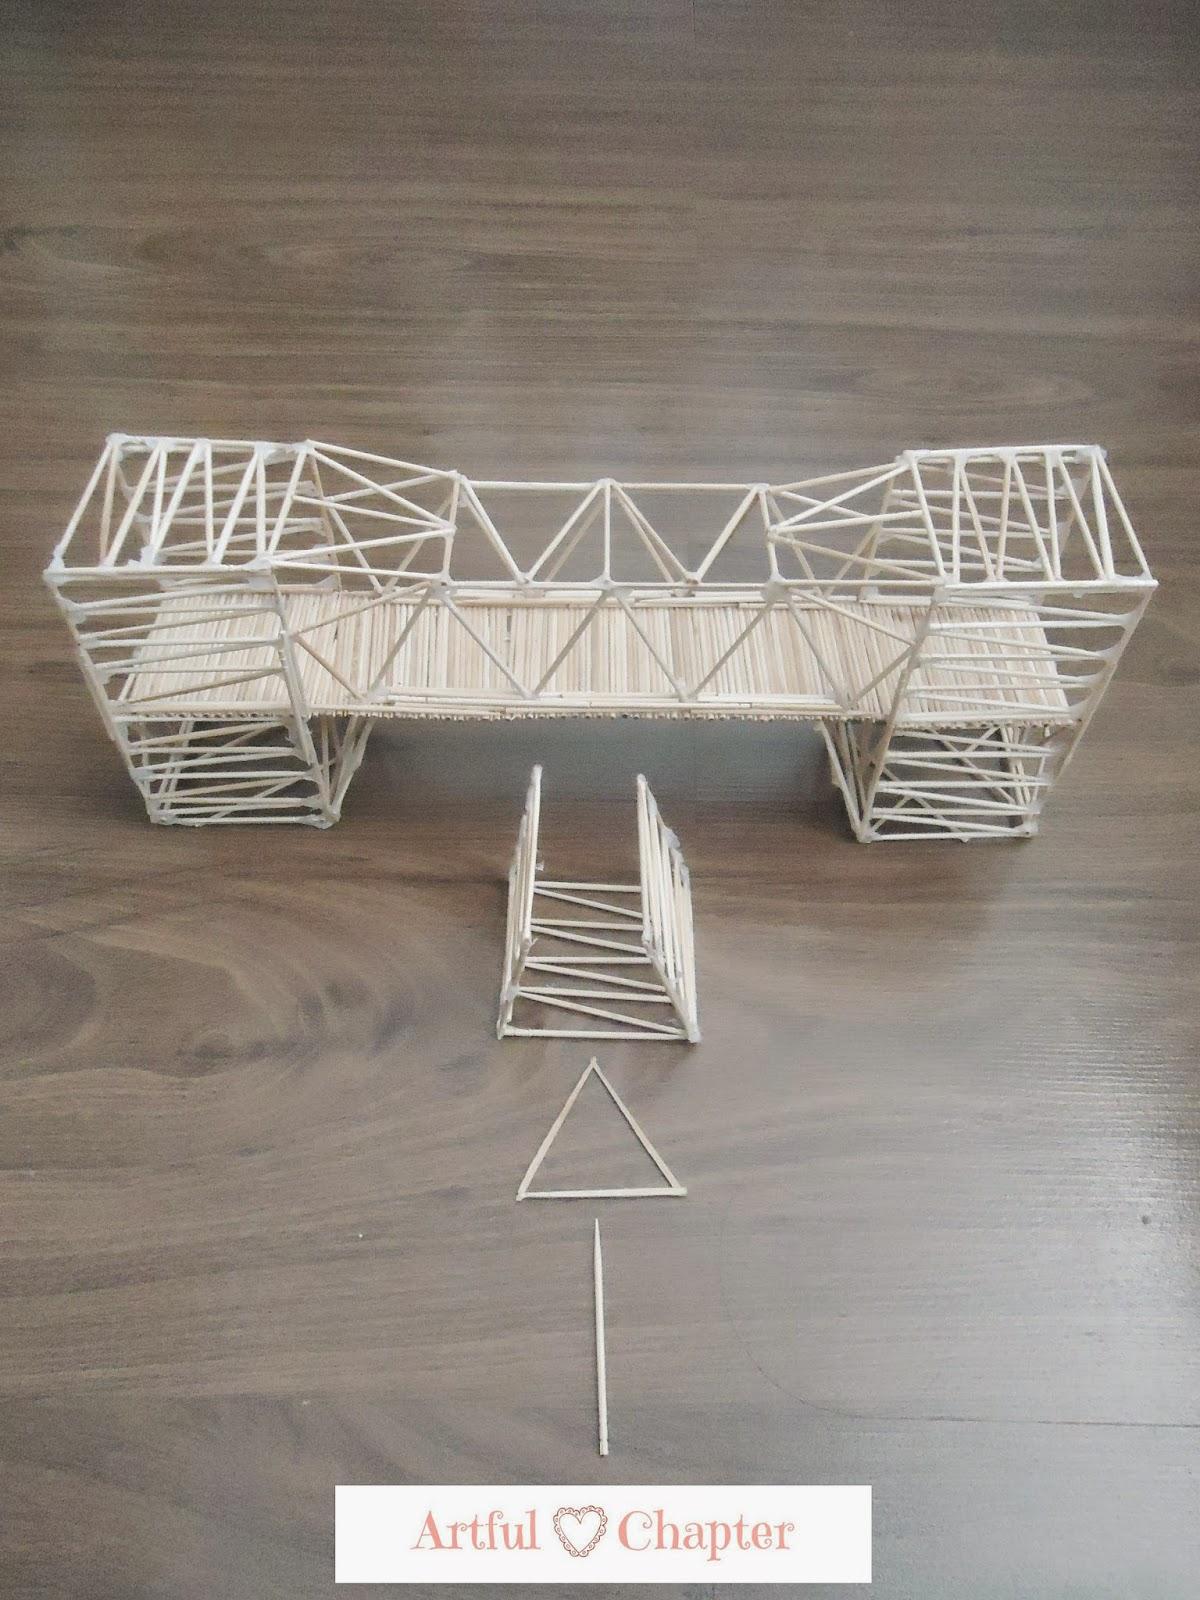 Toothpick Bridge Project Artful Chapter